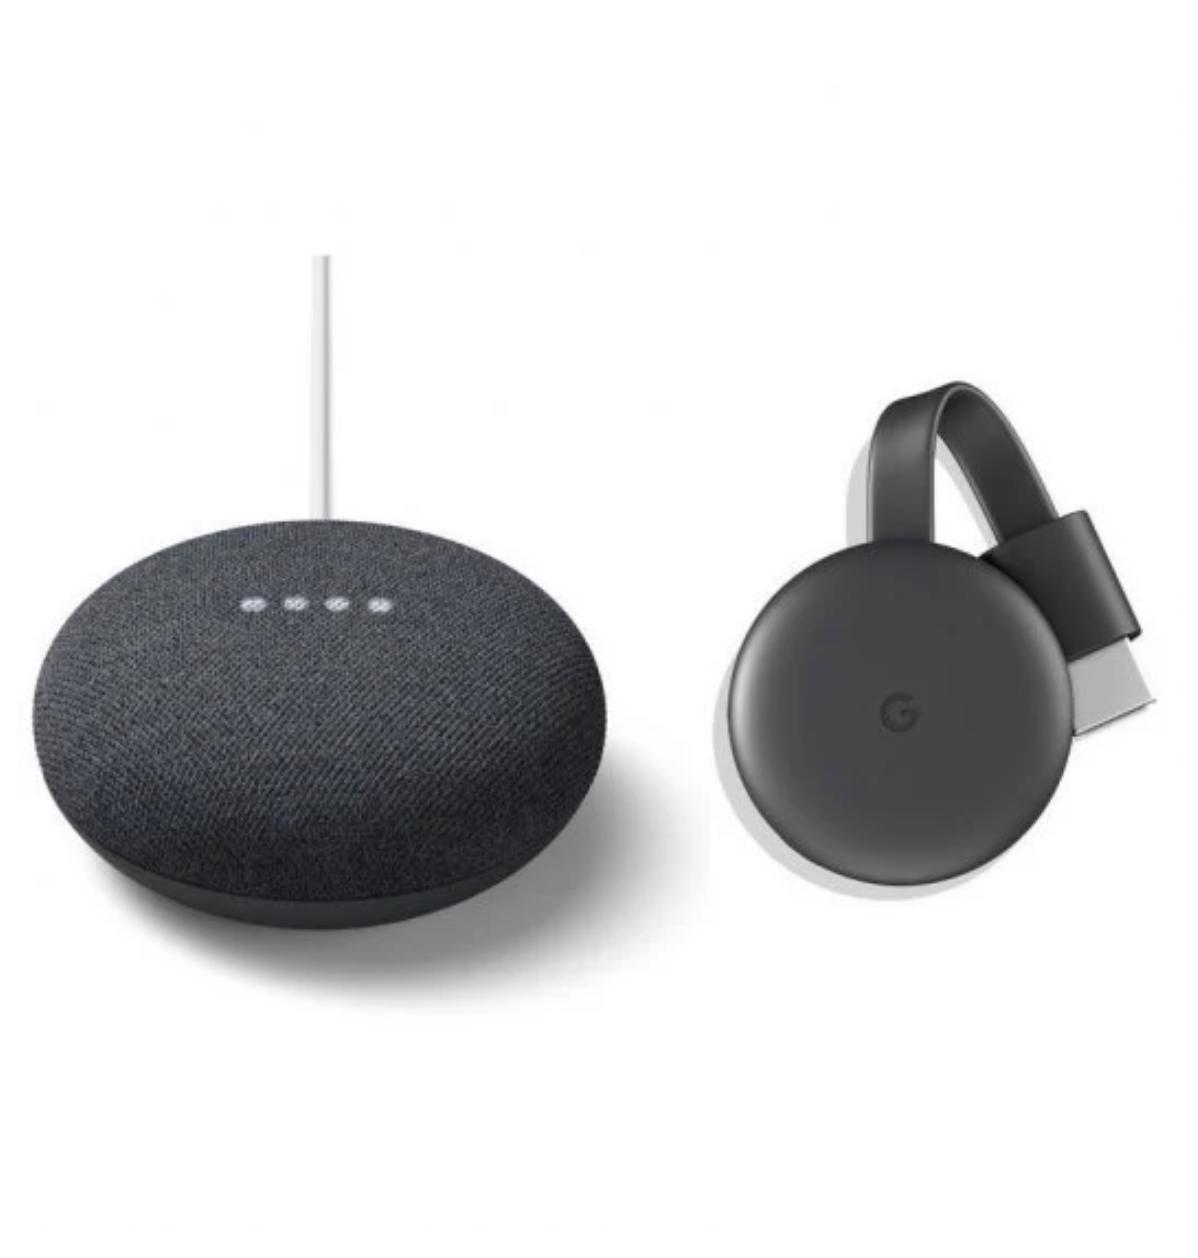 Google Pack Nest Mini Altavoz Inteligente y Asistente Carbón + Chromecast 3